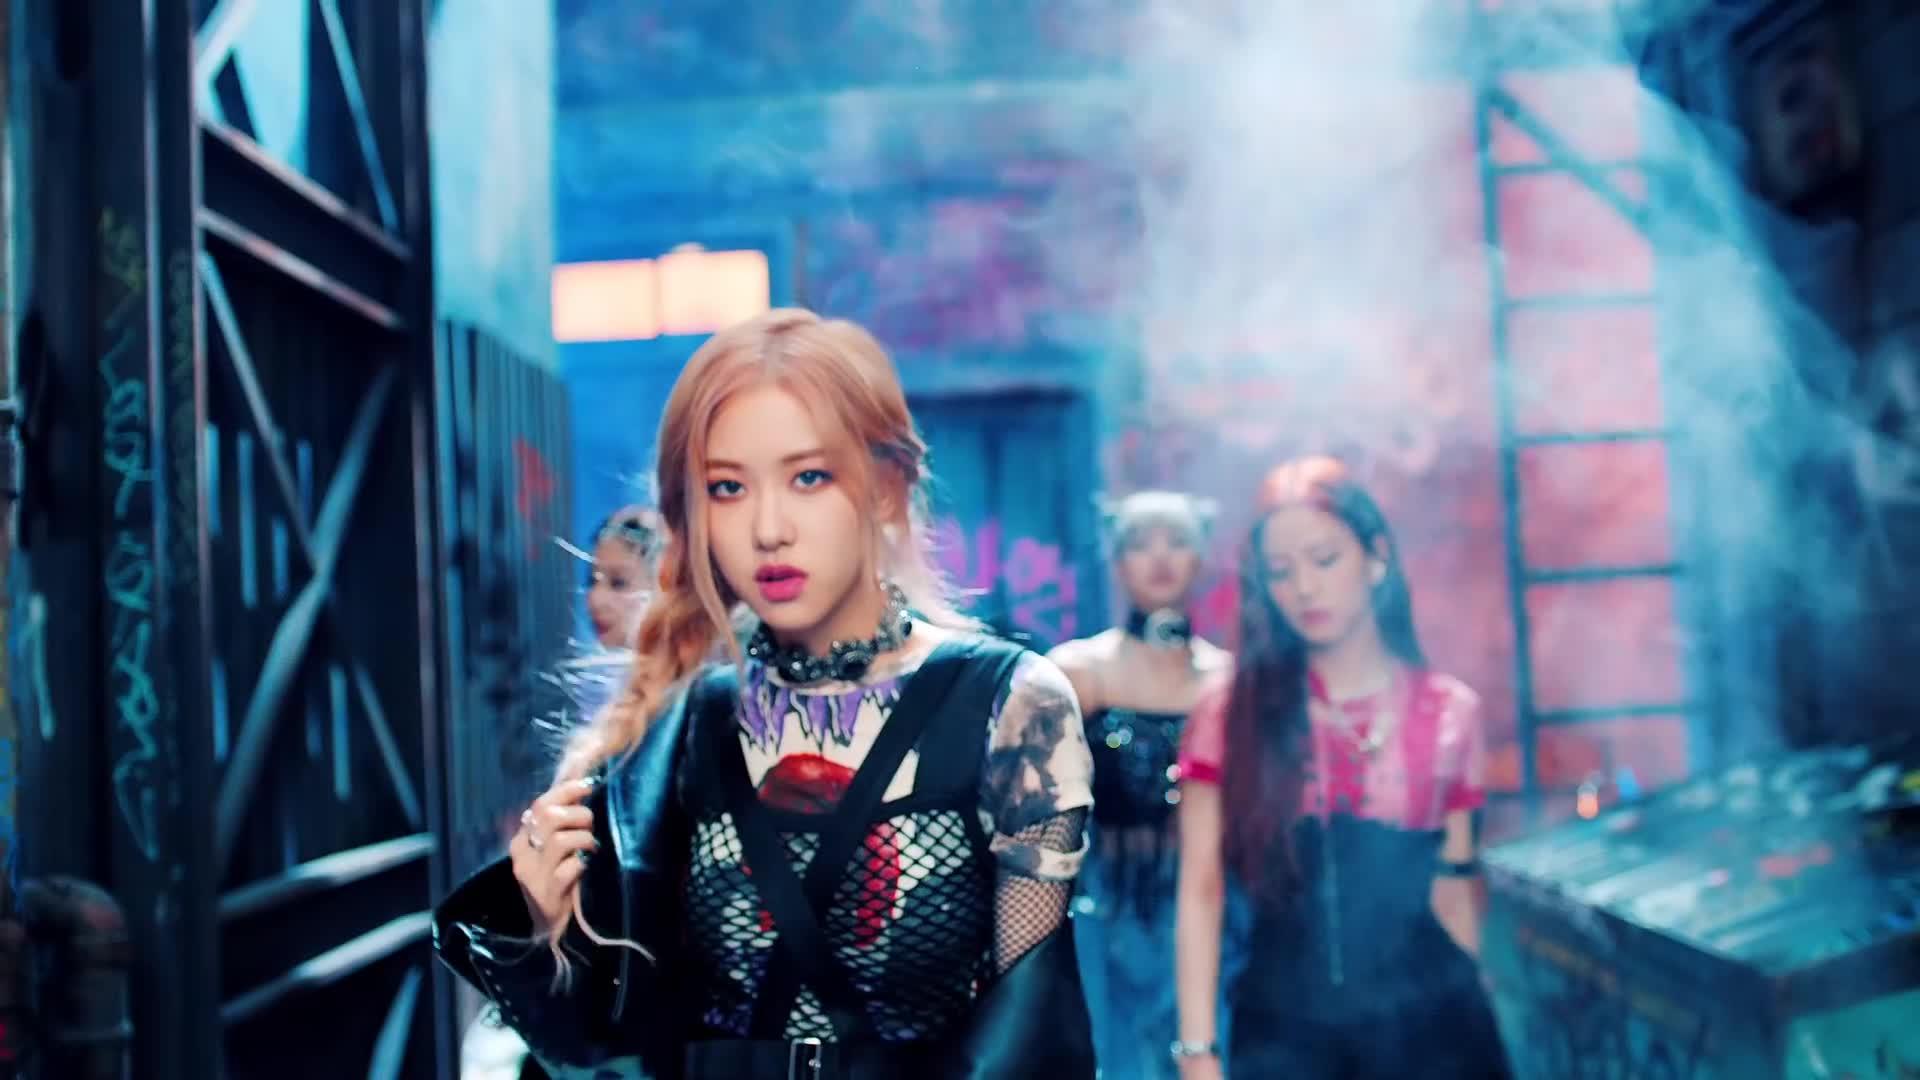 Blackpink Kill This Love Wallpaper Hd K Pop Fans Hub